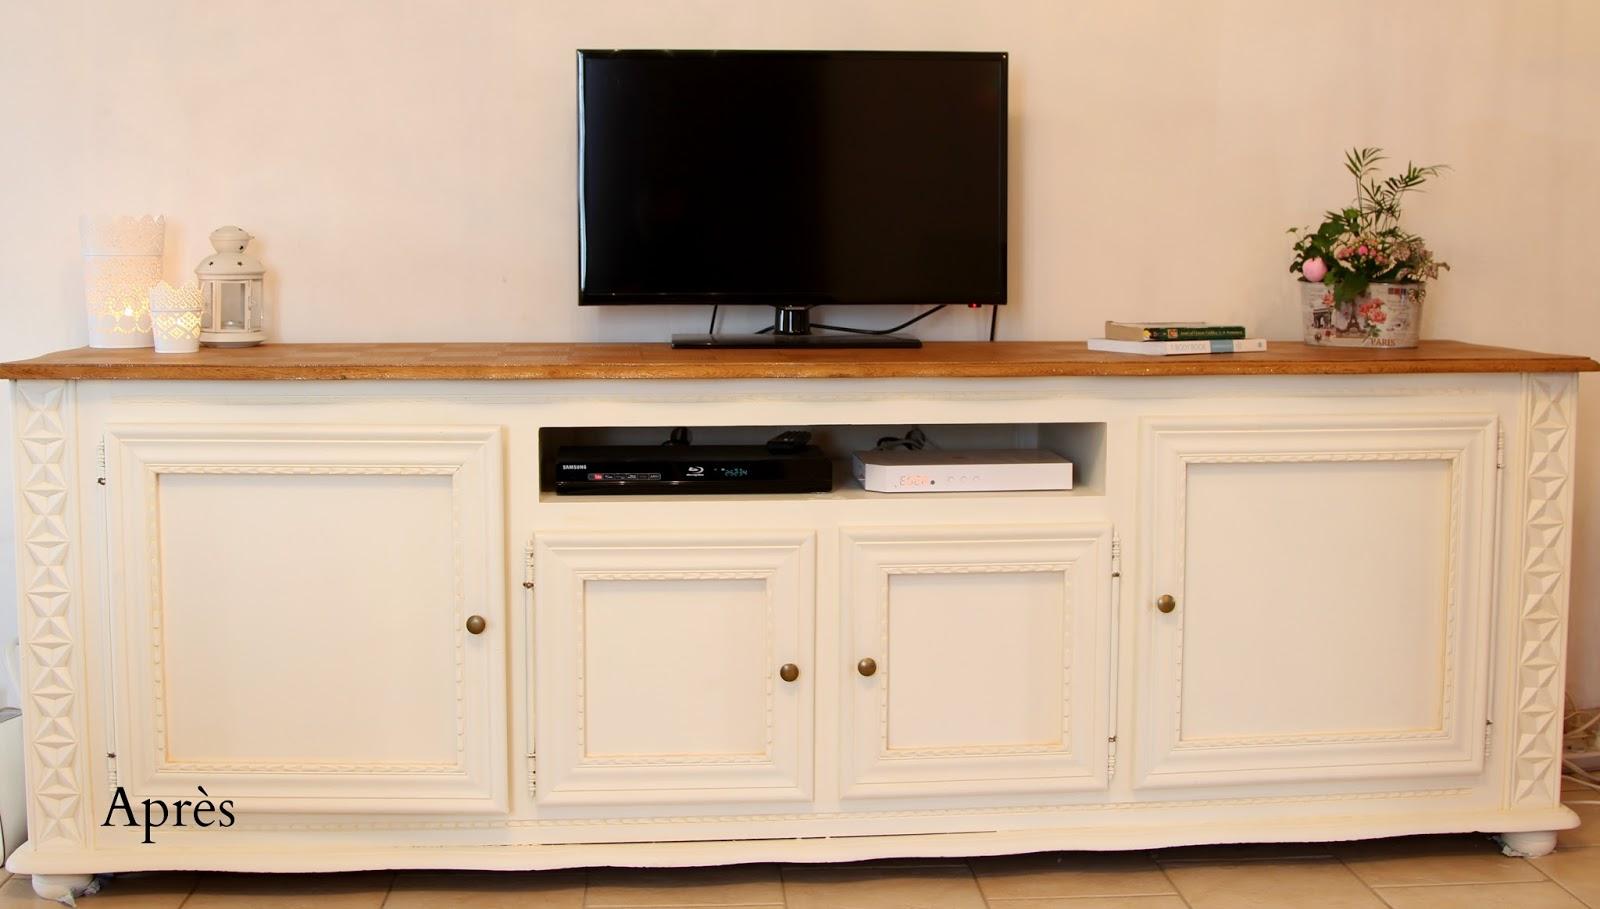 merry patch transformer un vieux meuble. Black Bedroom Furniture Sets. Home Design Ideas